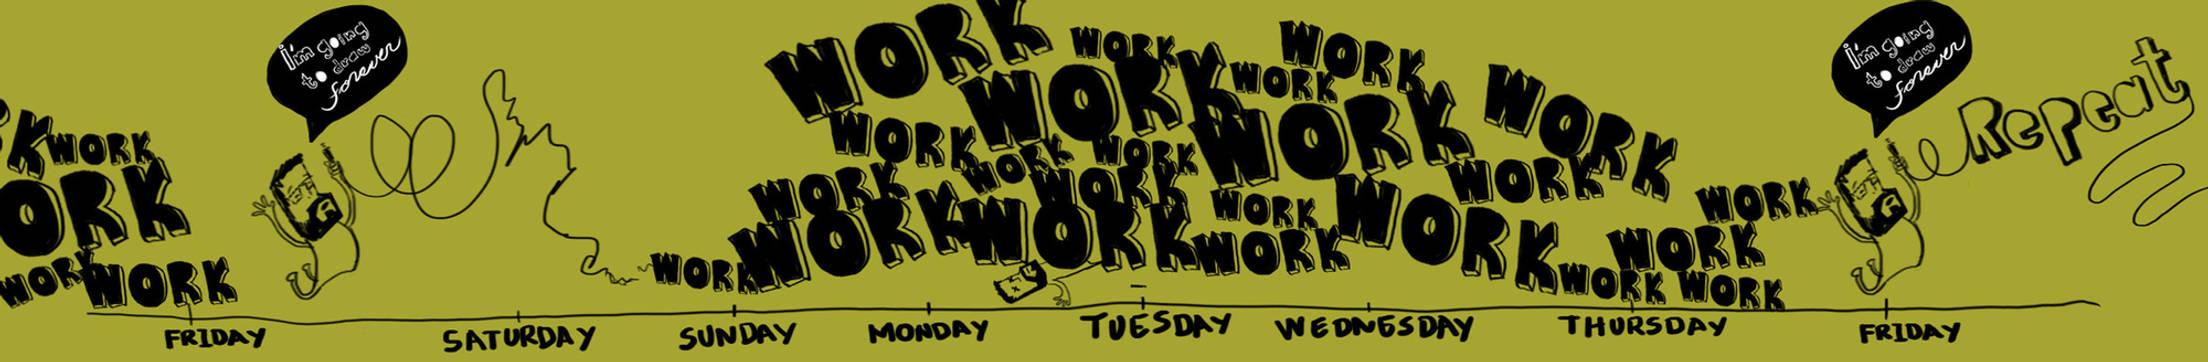 Weekly agenda D: